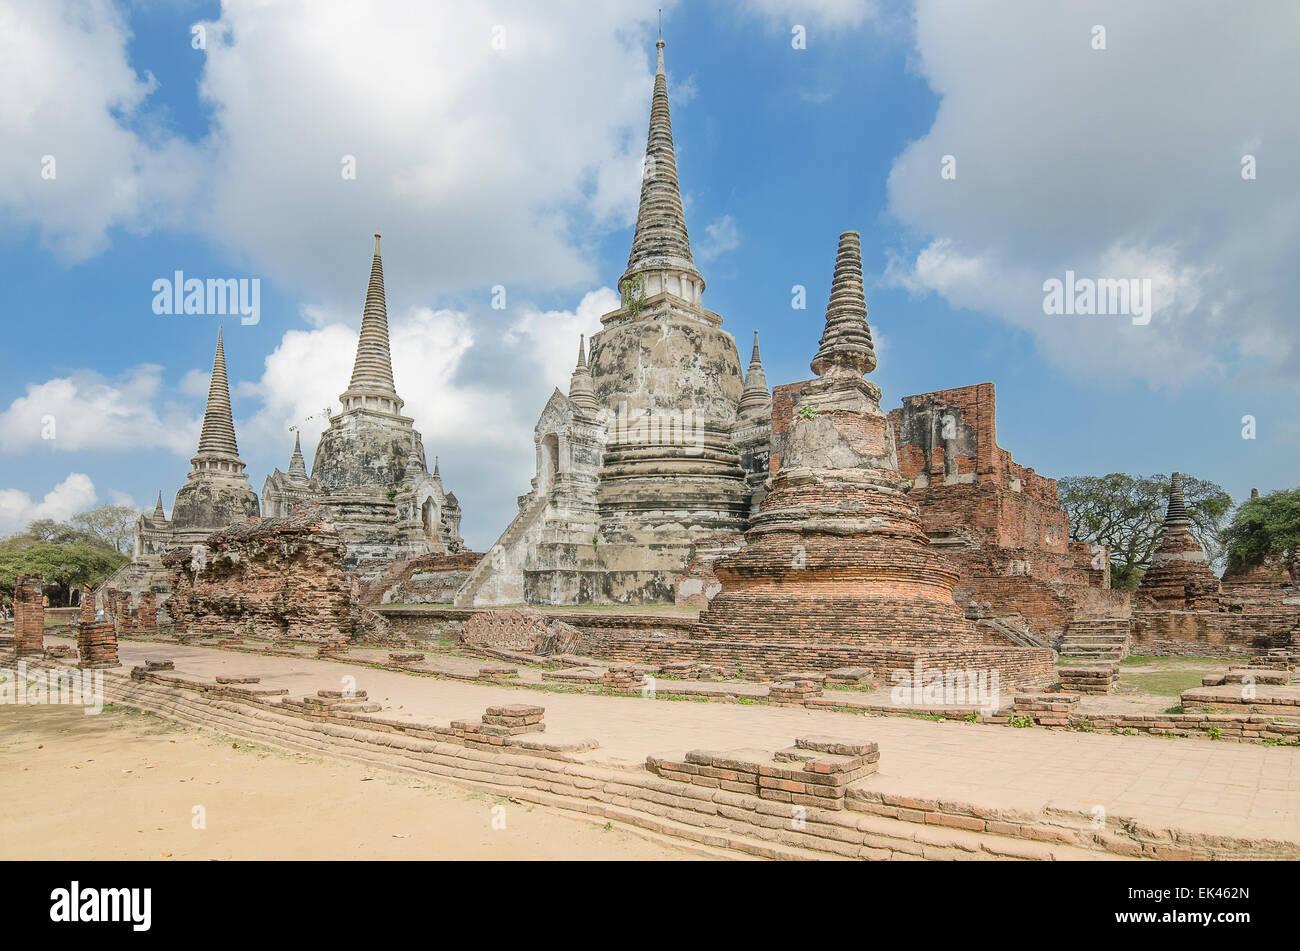 Alte Tempel-Architektur, Wat Phra Si Sanphet in Ayutthaya, Thailand, World Heritage Site Stockbild